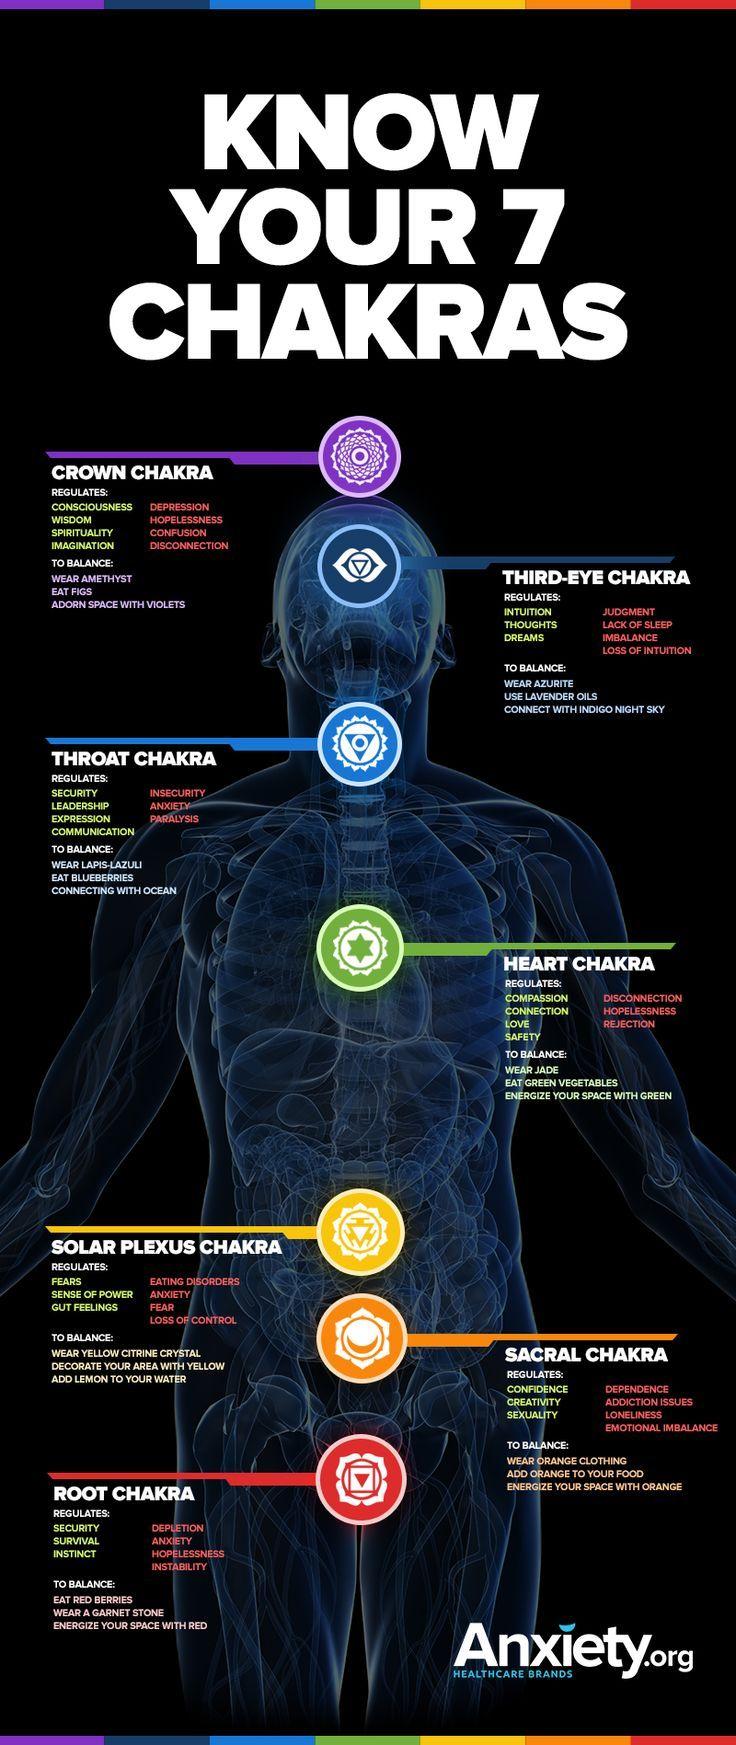 Balanced Chakras Reduce Anxiety | Chakra balancing tips infographic | Meditation | Mindfulness | Mental health & self-care